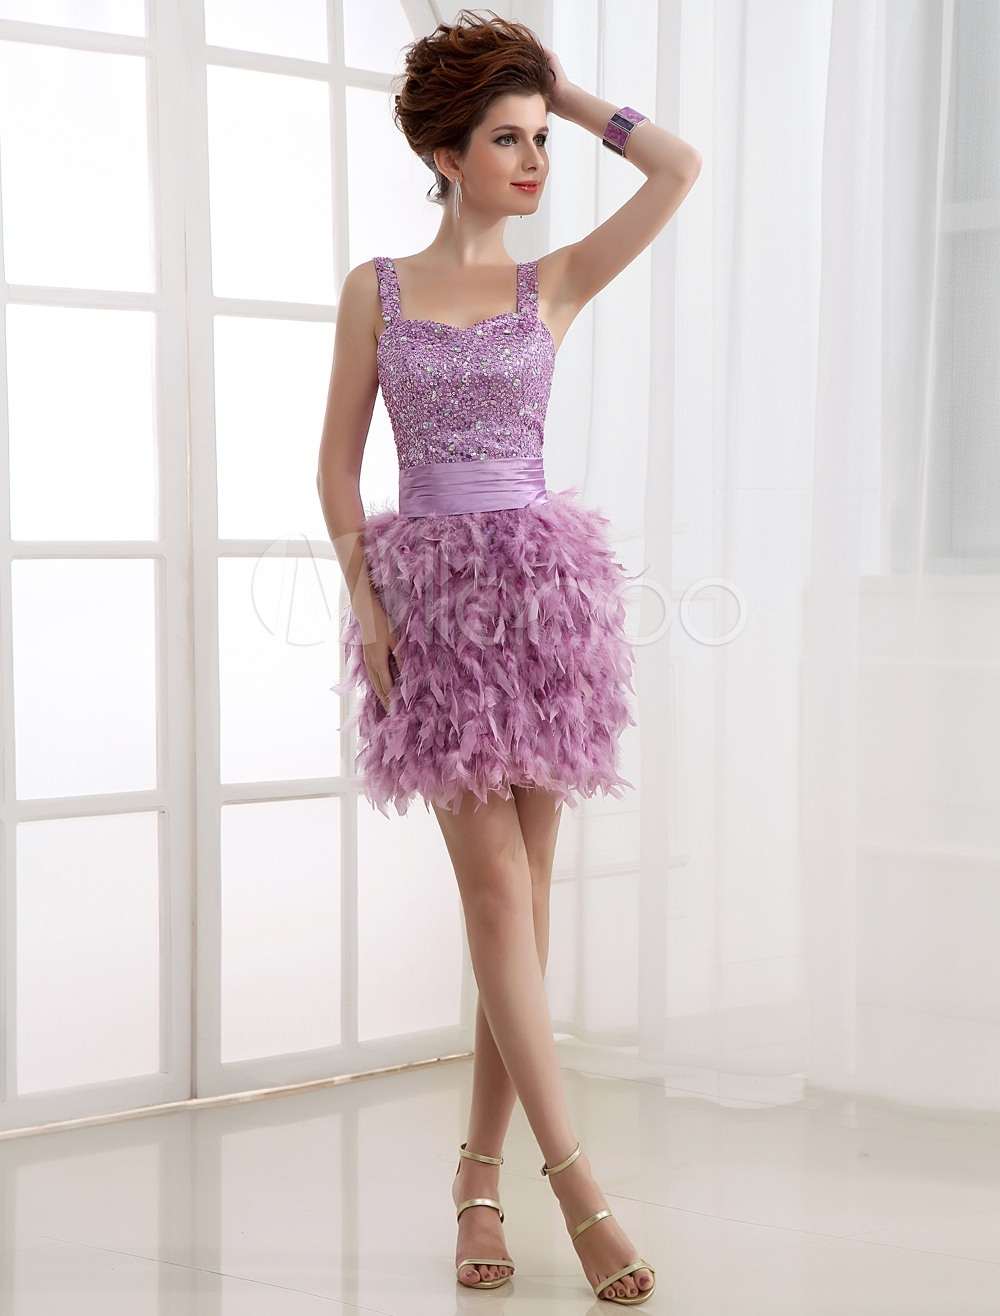 Kreativ Kleid Mit Federn Vertrieb - Abendkleid